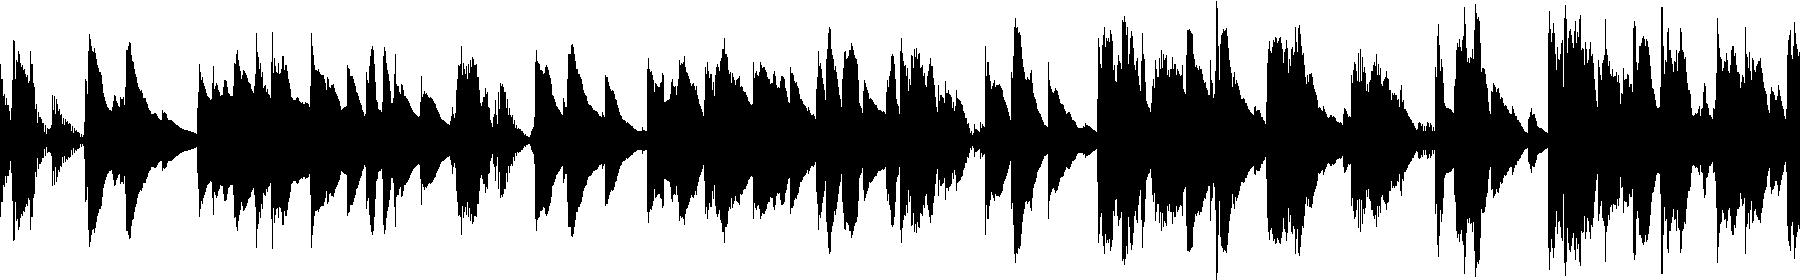 dts chordlp 51b cm dry